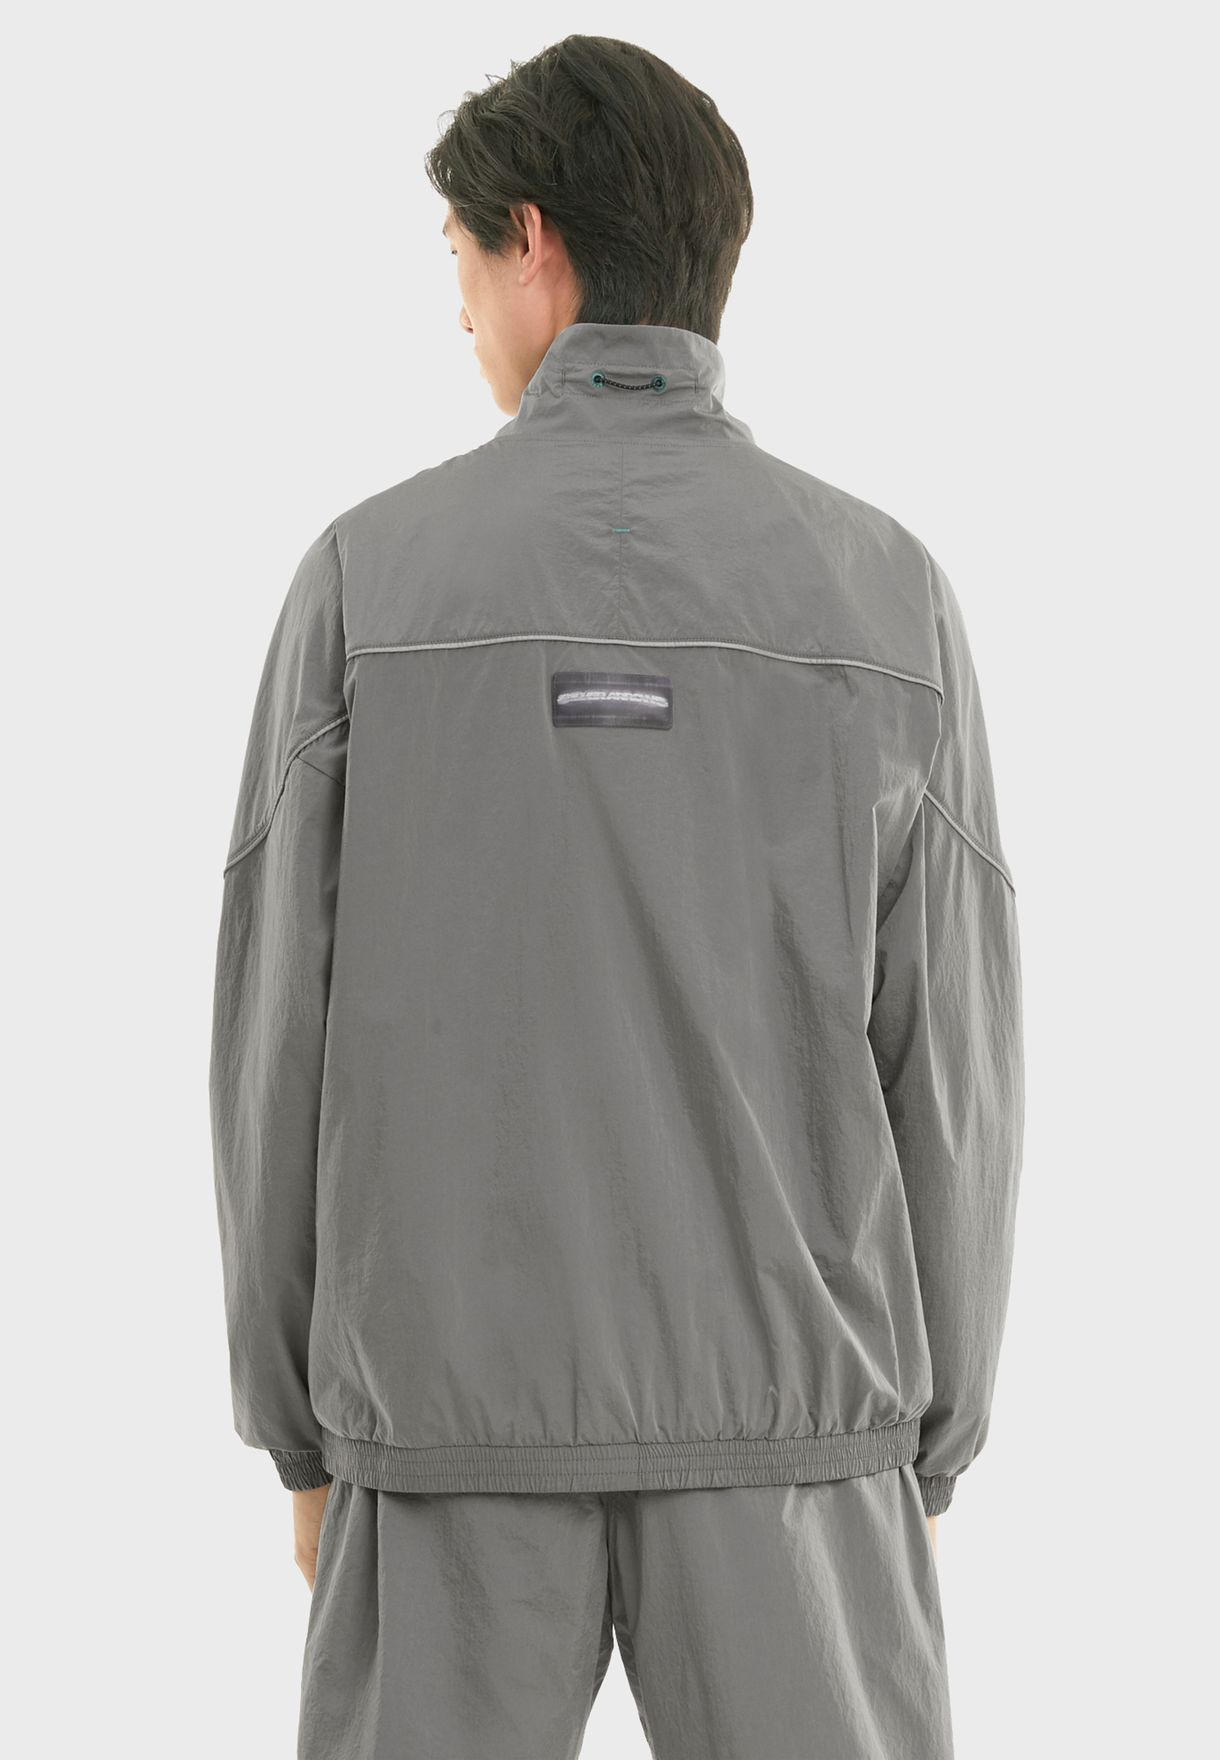 MAPF1 Street Woven Jacket